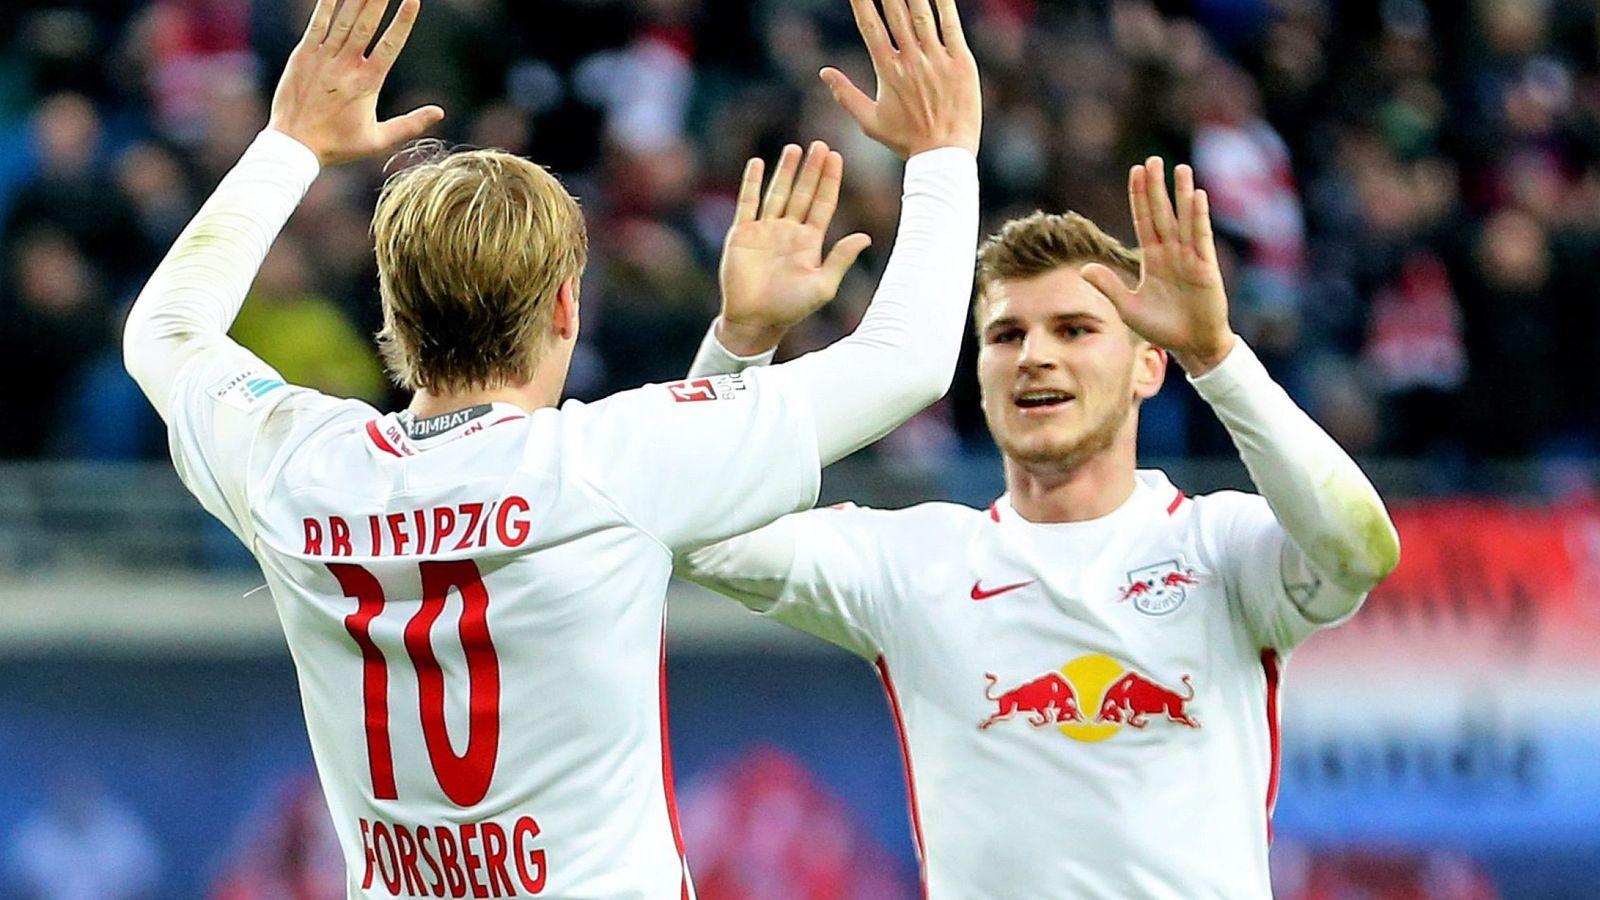 Foto: Emil Forsberg y Timo Werner celebran un gol de RB Leipzig al Mainz 05 (Jan Woitas/EFE-EPA)